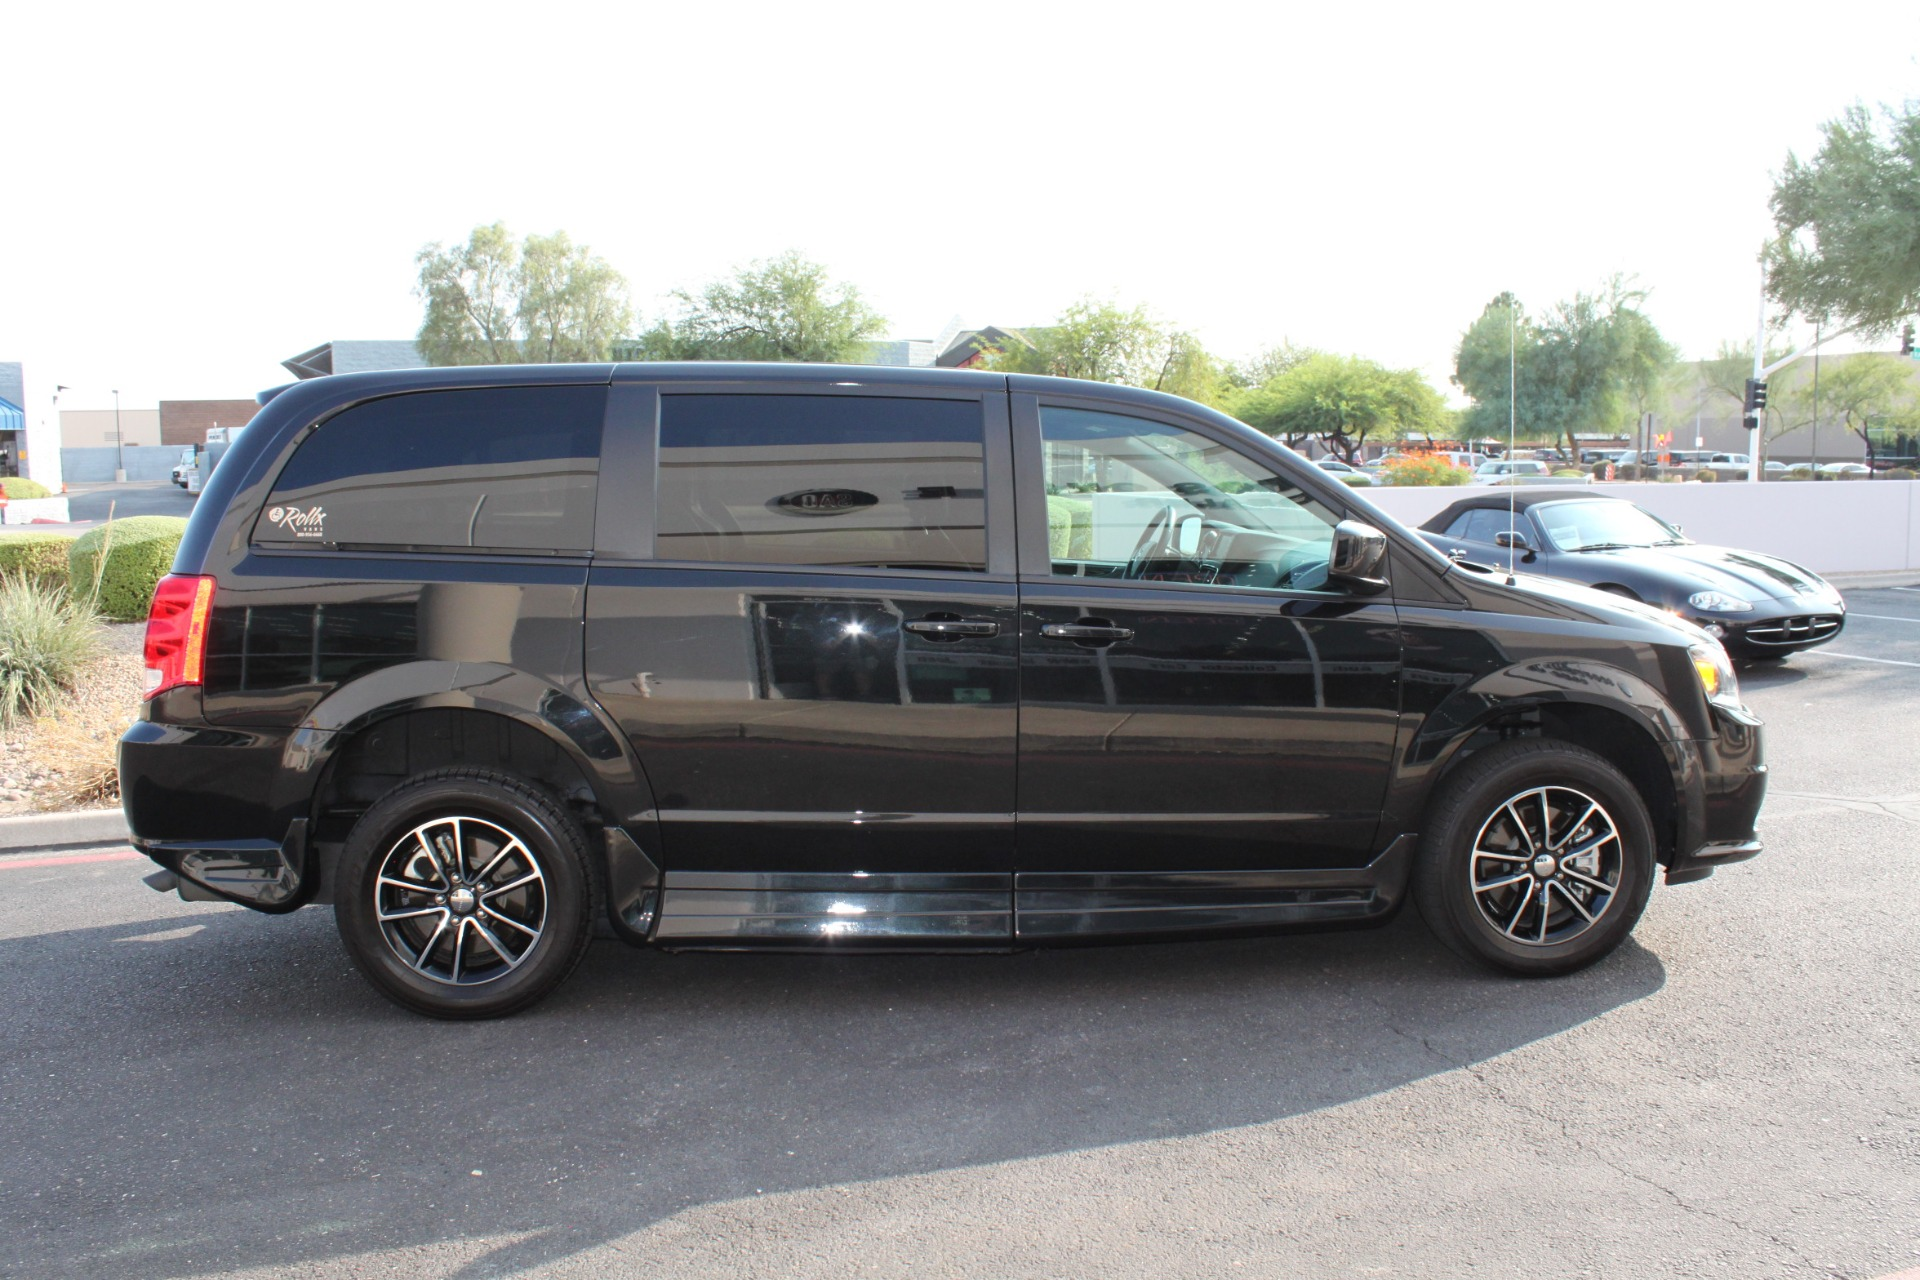 Used-2018-Dodge-Grand-Caravan-SXT-Rollx-Mobility-Conversion-Wrangler